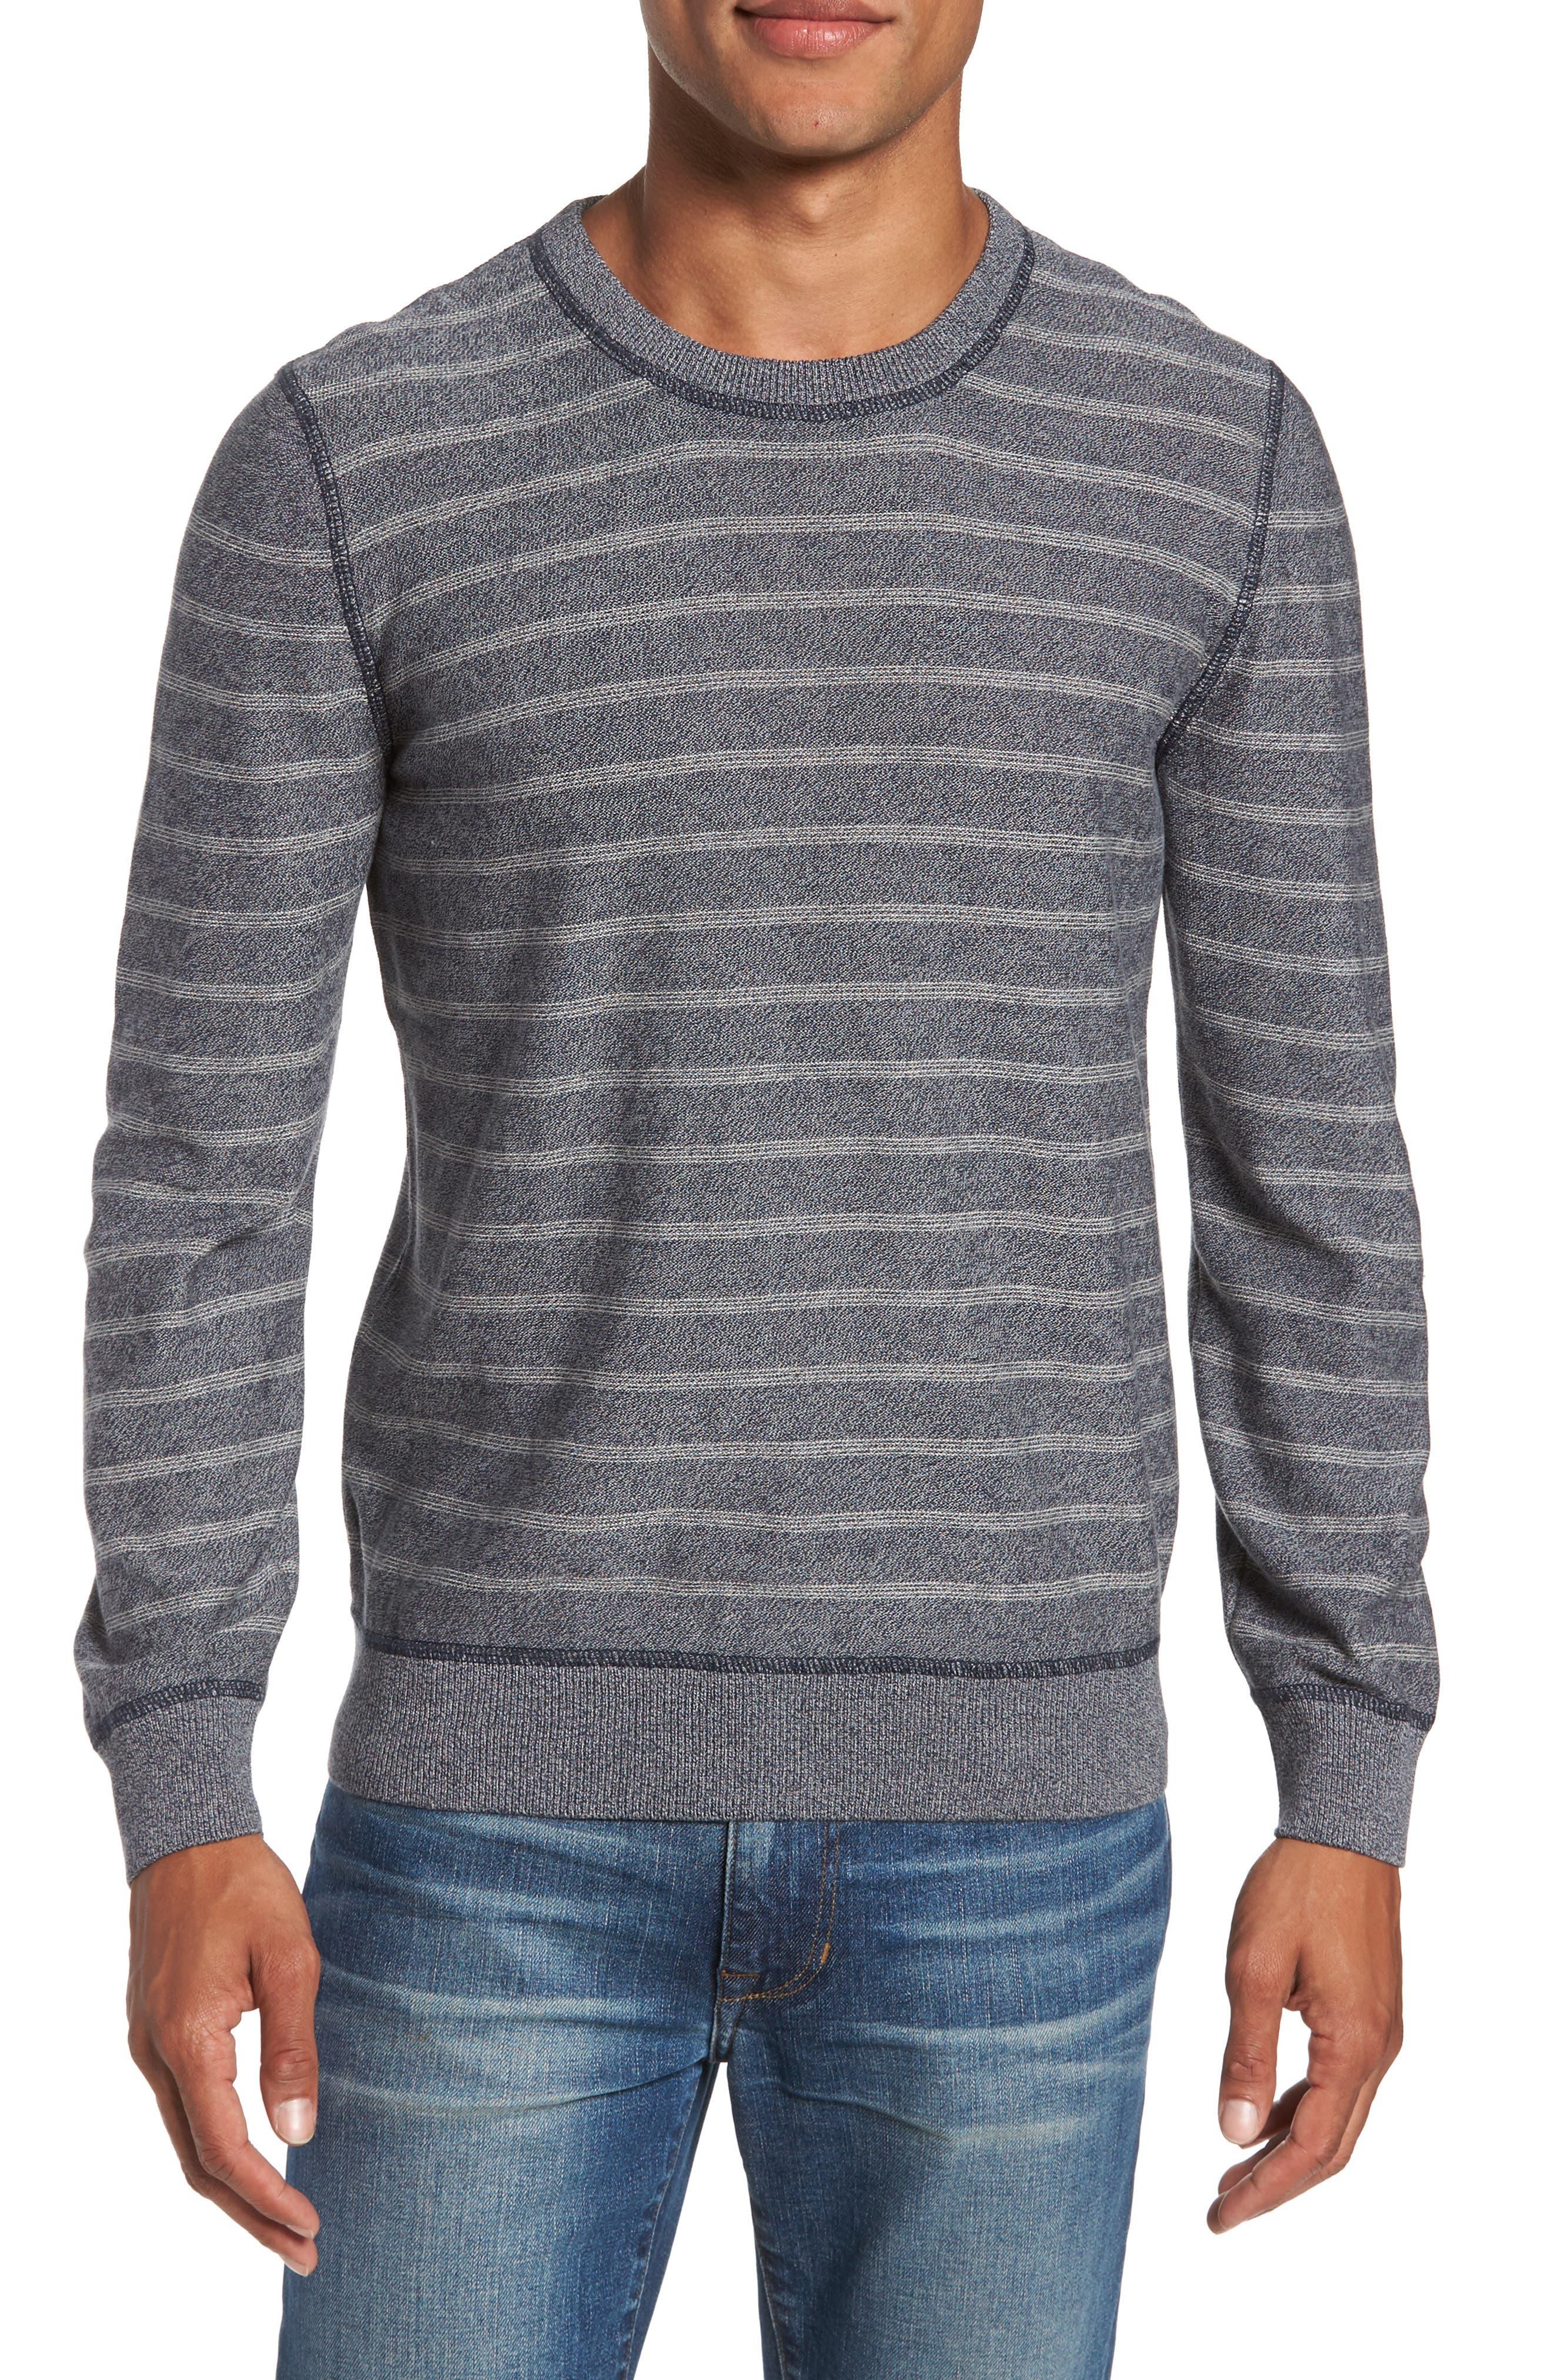 Tanner Crewneck Sweatshirt,                         Main,                         color, 021